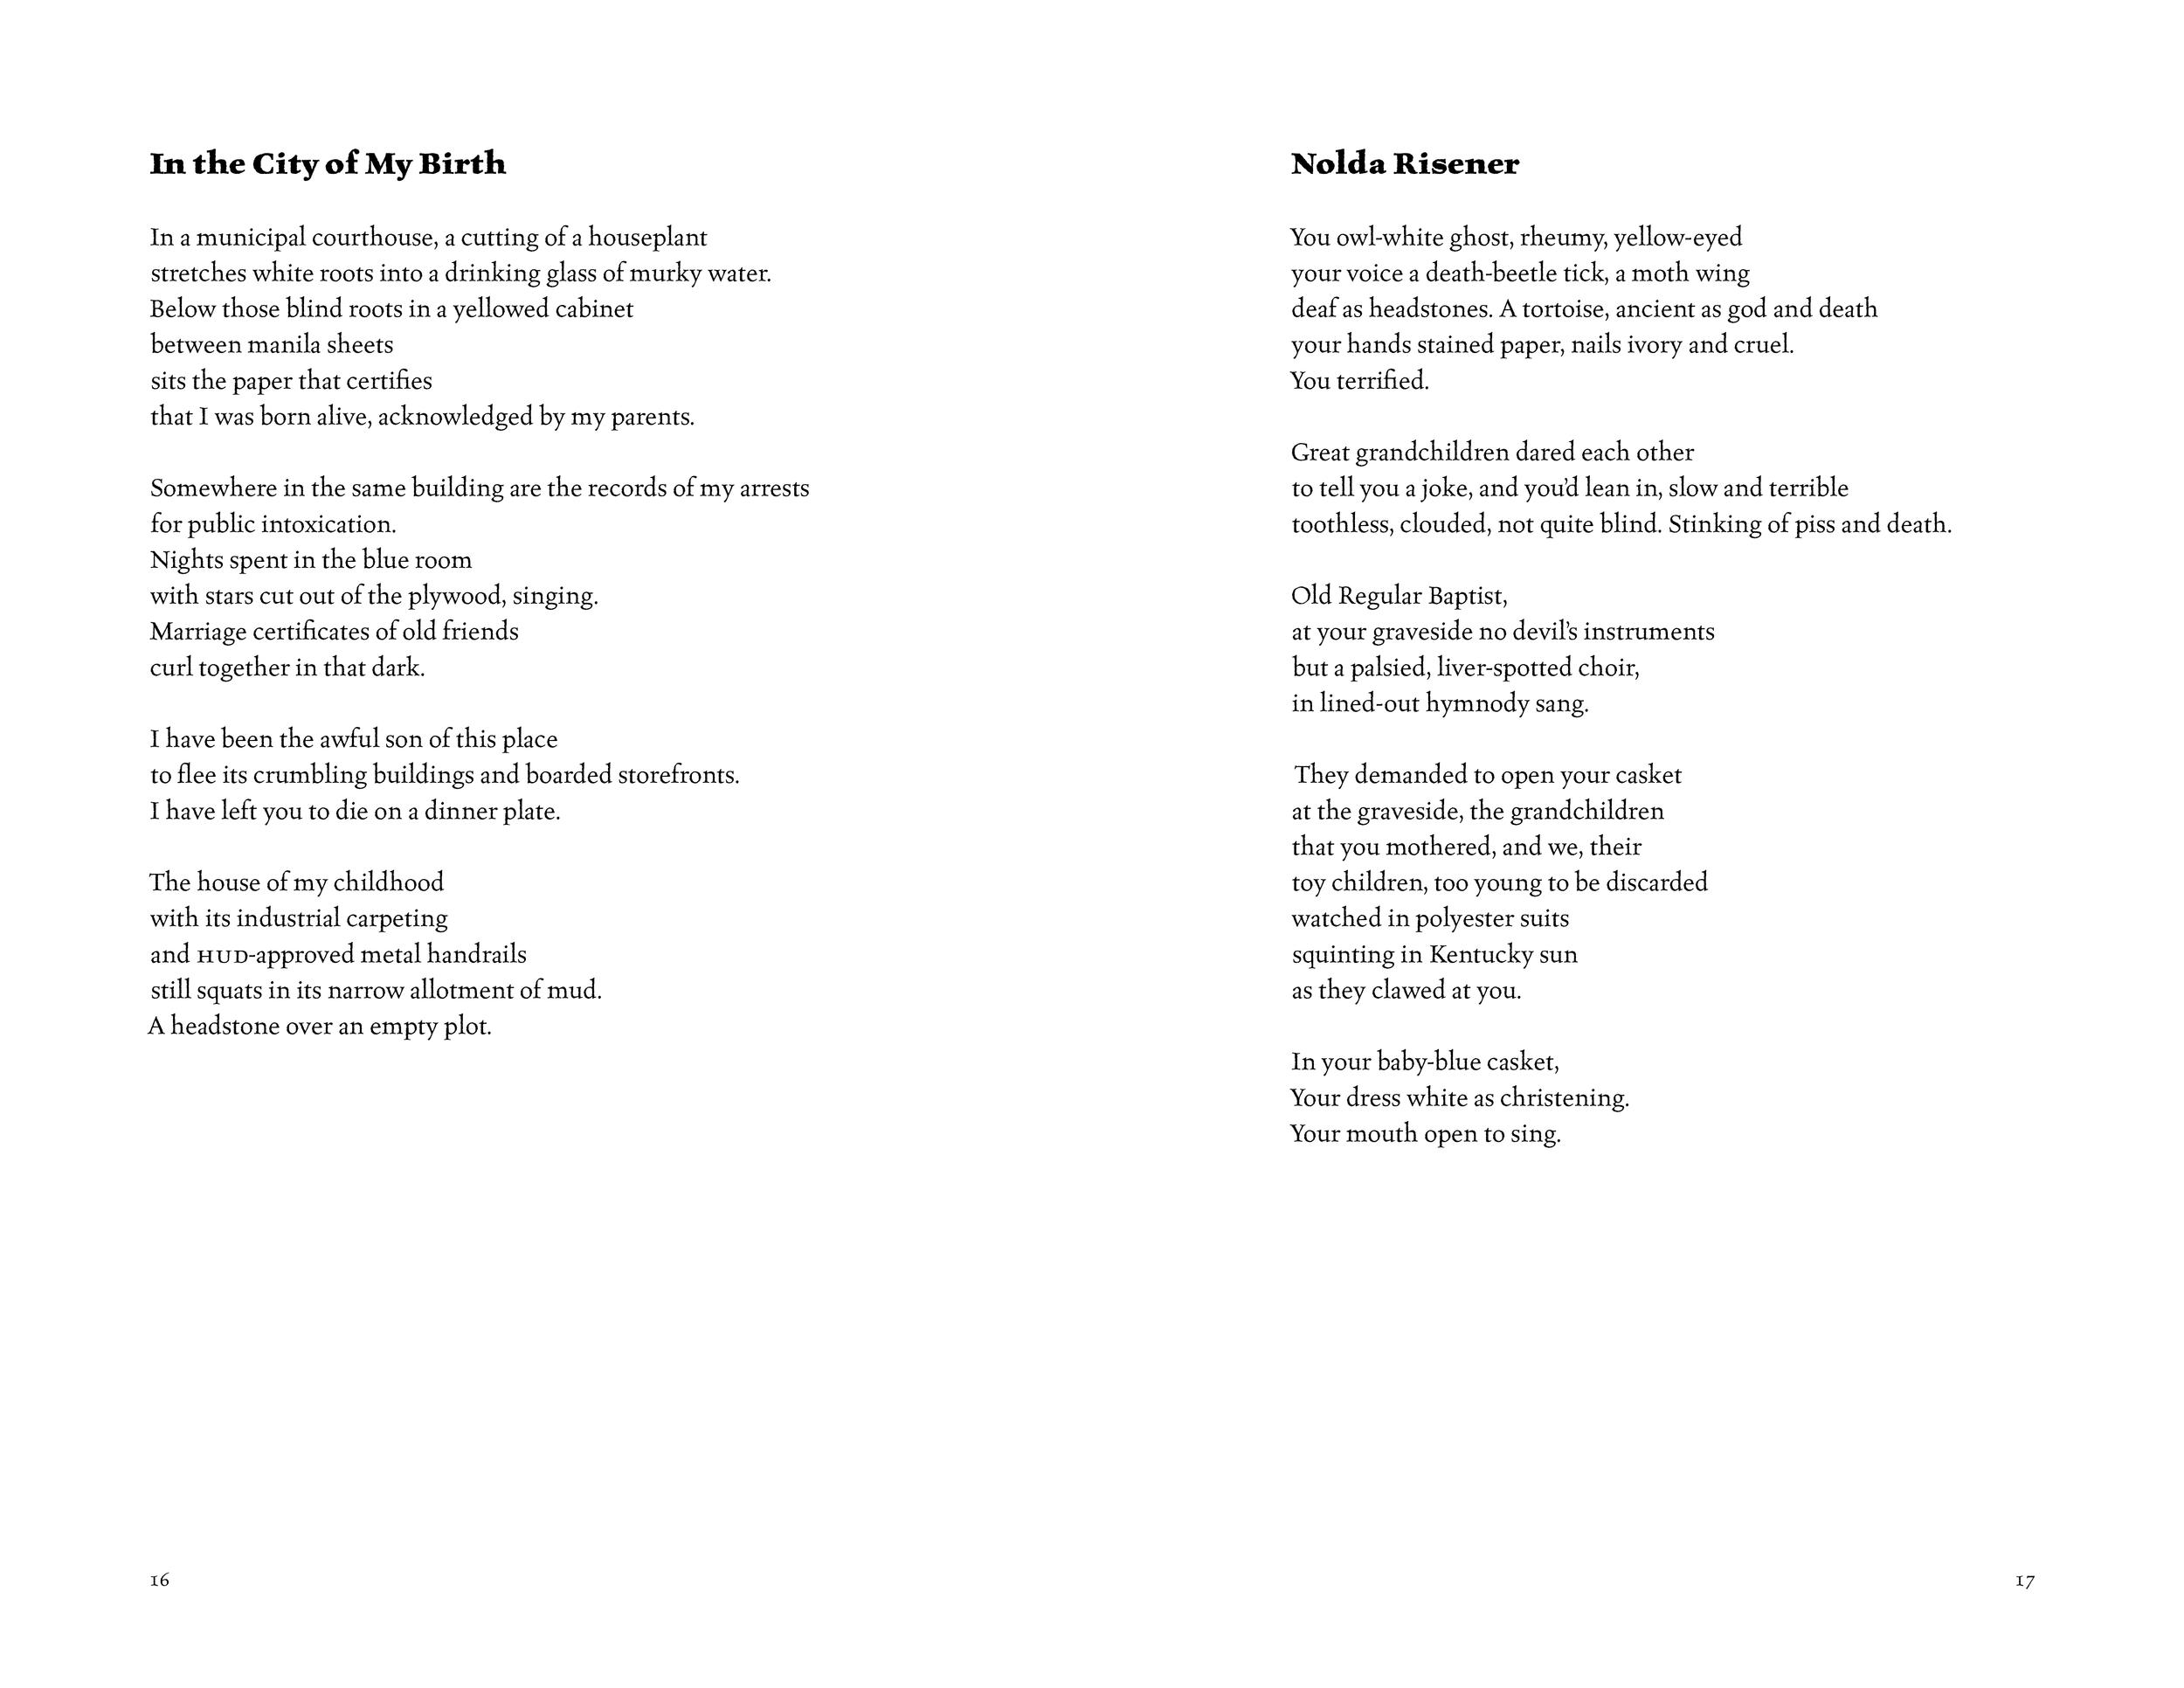 Poems from DEVIL'S RADIO